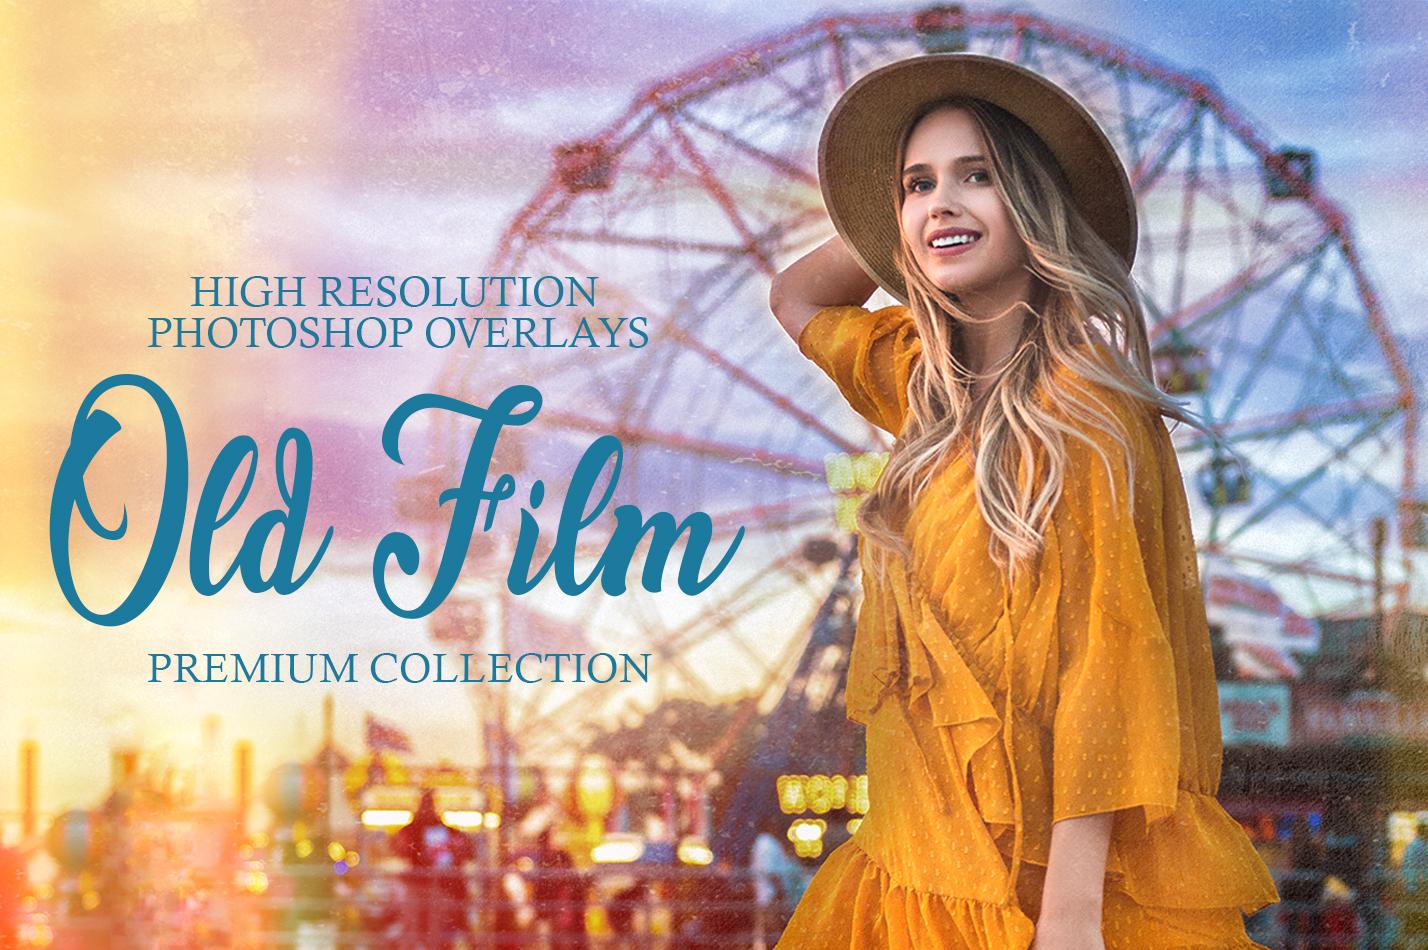 30 Pro Old Film Overlay for Photoshop | Old Film Overlay Photoshop